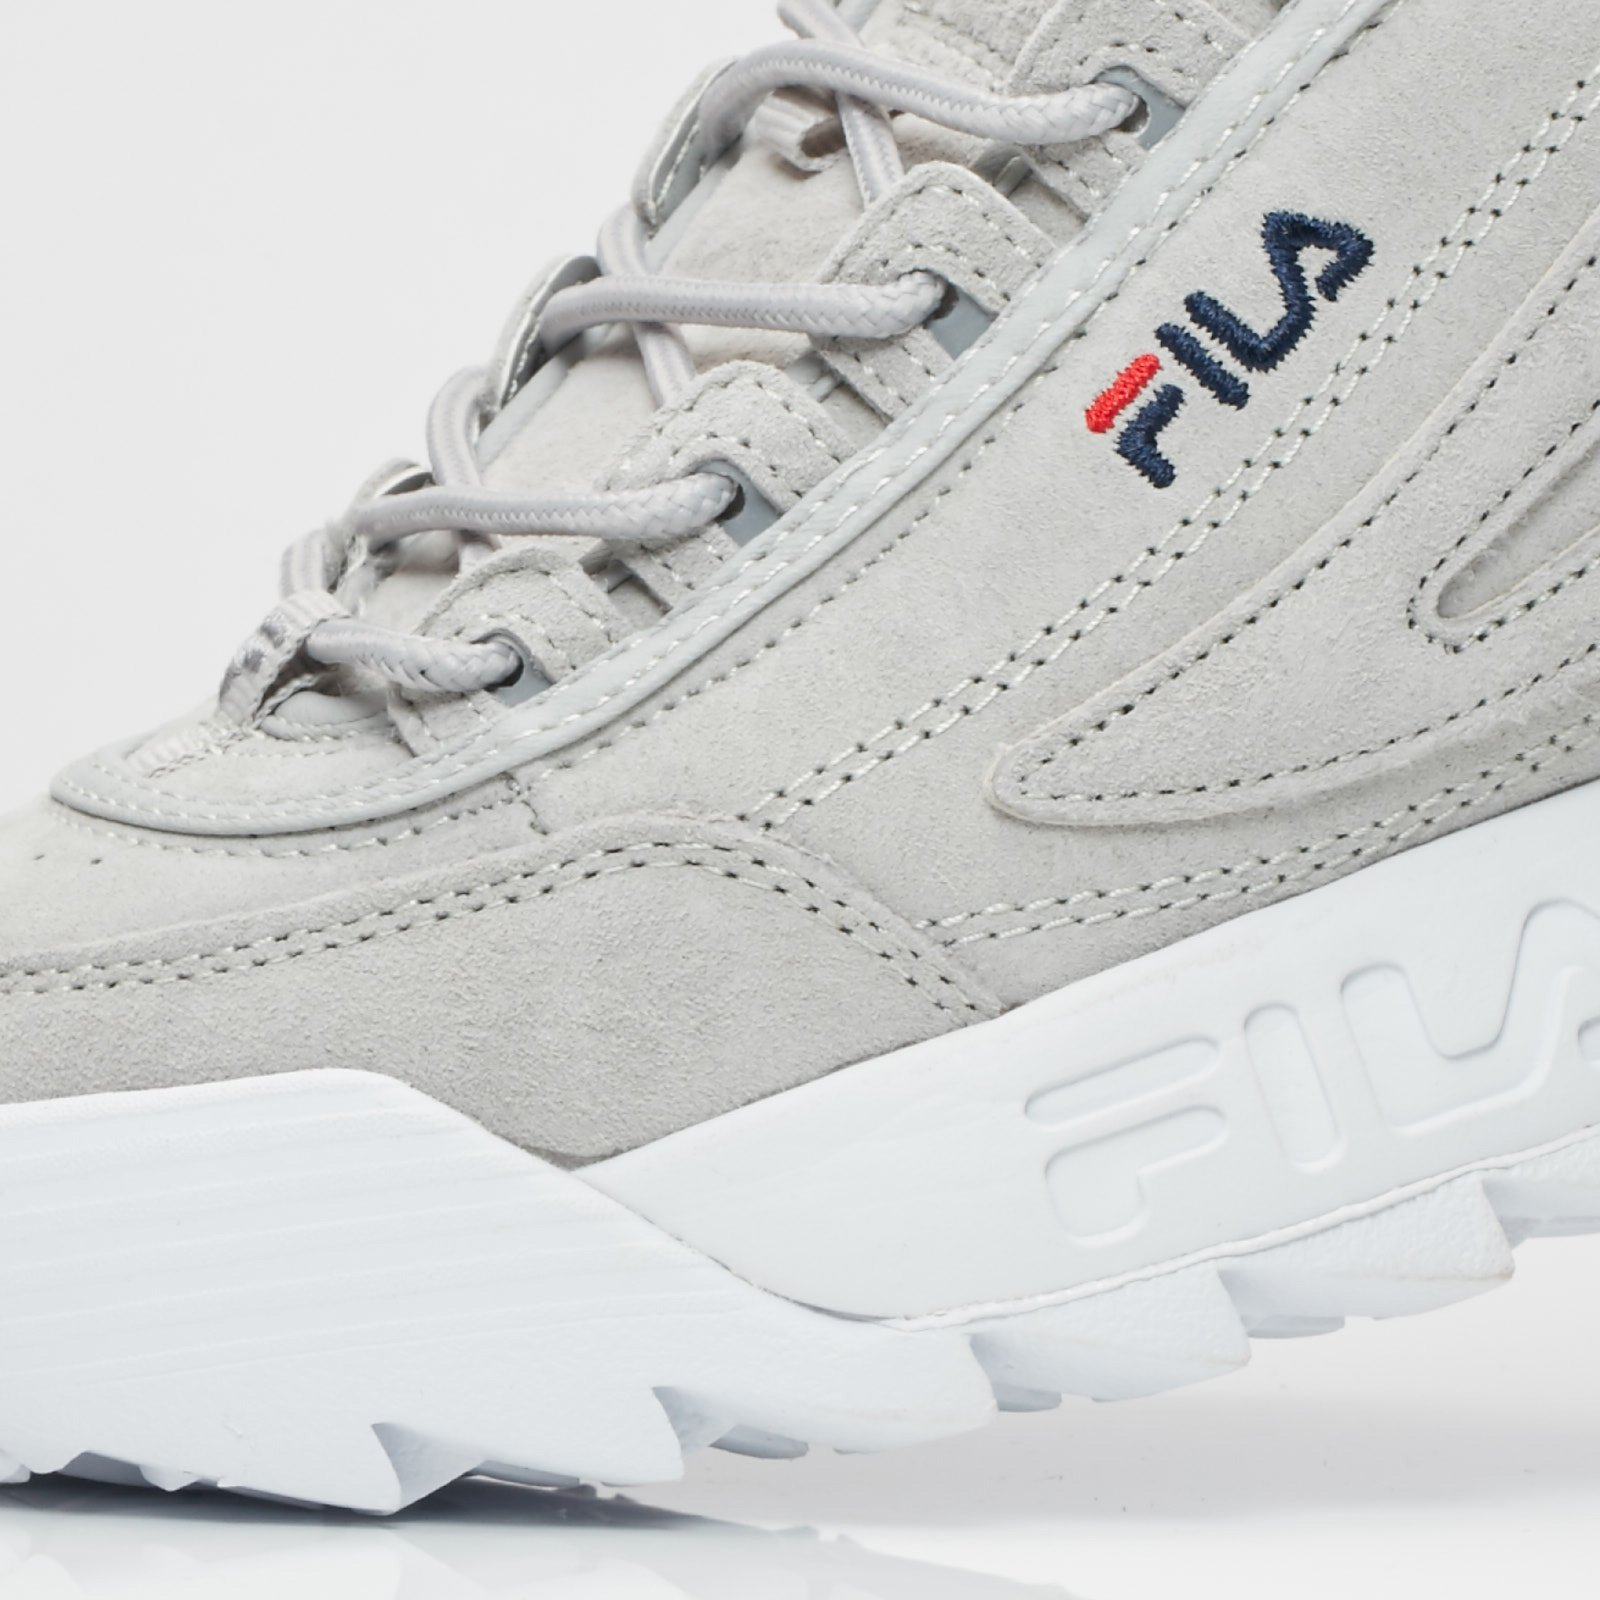 Fila Disruptor II Premium Suede - 5fm00038-063 - Sneakersnstuff I ...